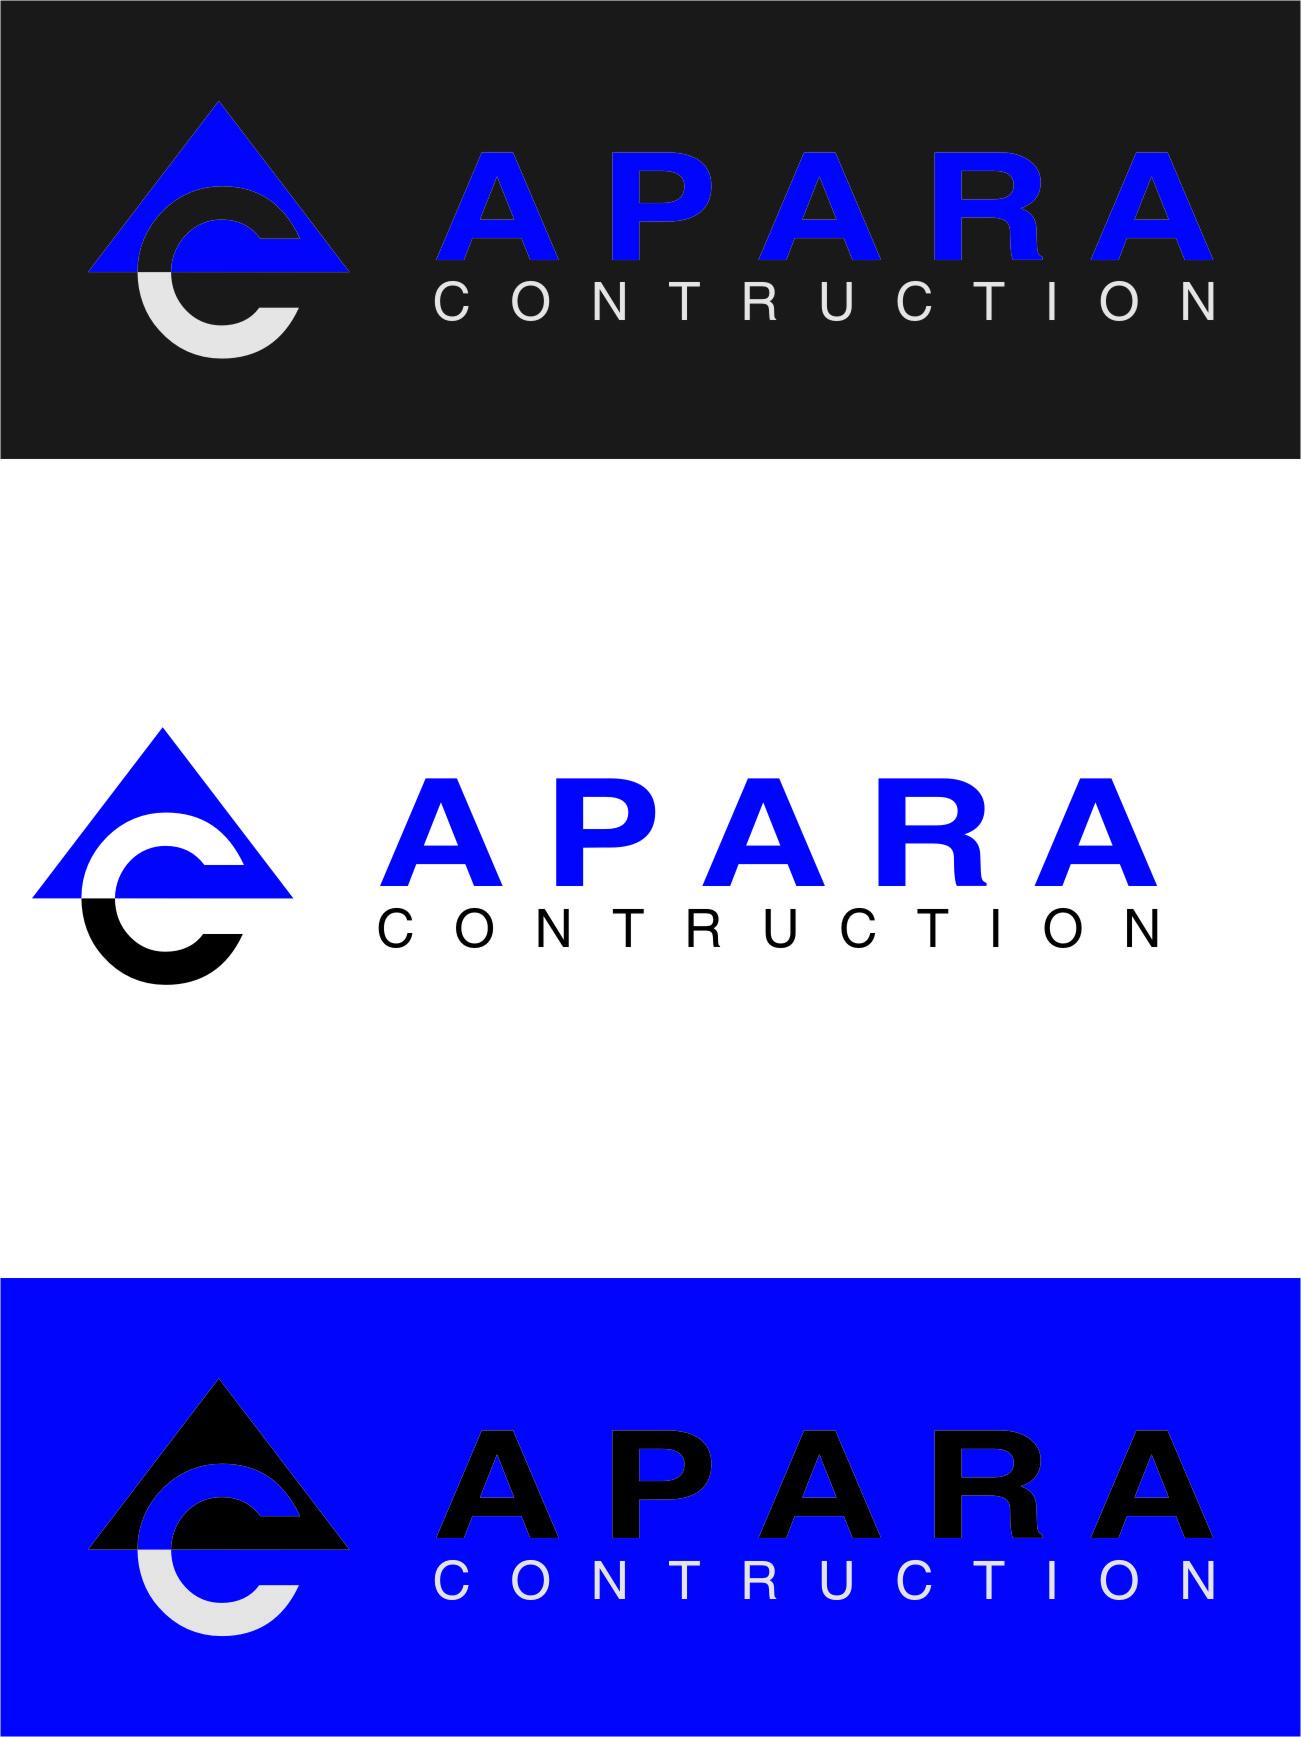 Logo Design by RasYa Muhammad Athaya - Entry No. 199 in the Logo Design Contest Apara Construction Logo Design.